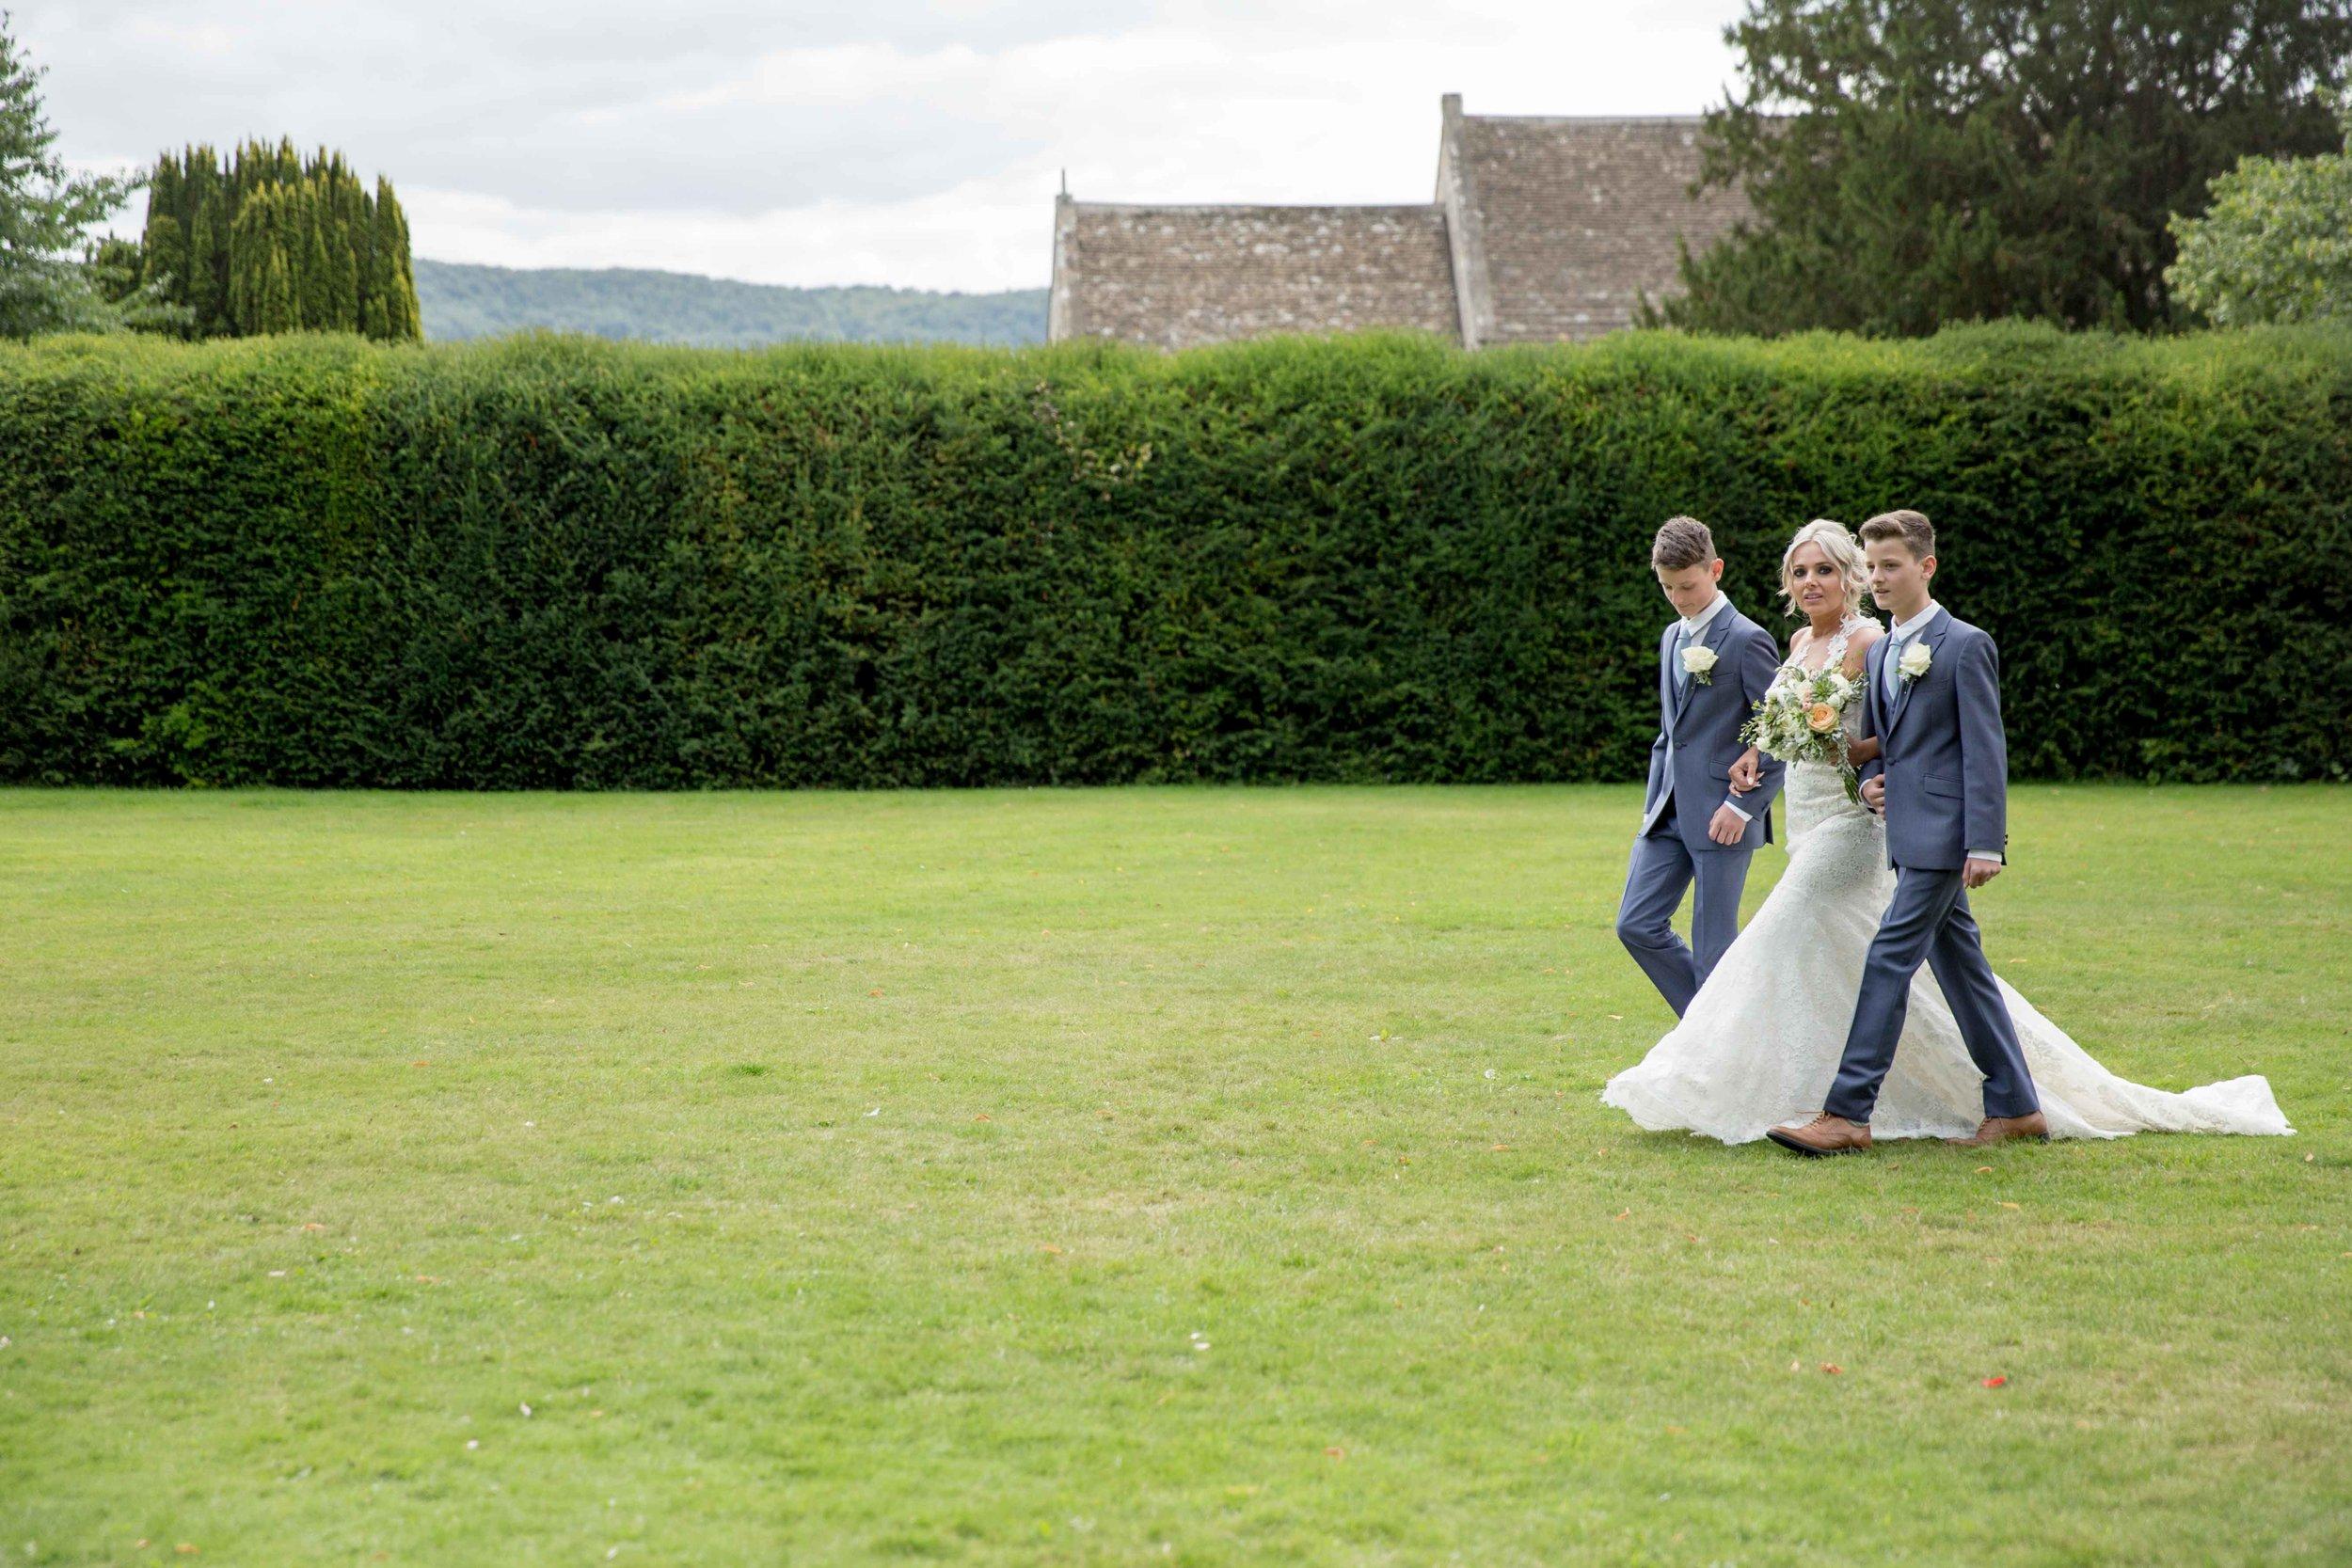 cotswold-wedding-photography-at-stonehouse-court-hotel-natalia-smith-photography-gloucestershire-wedding-photographer-10.jpg